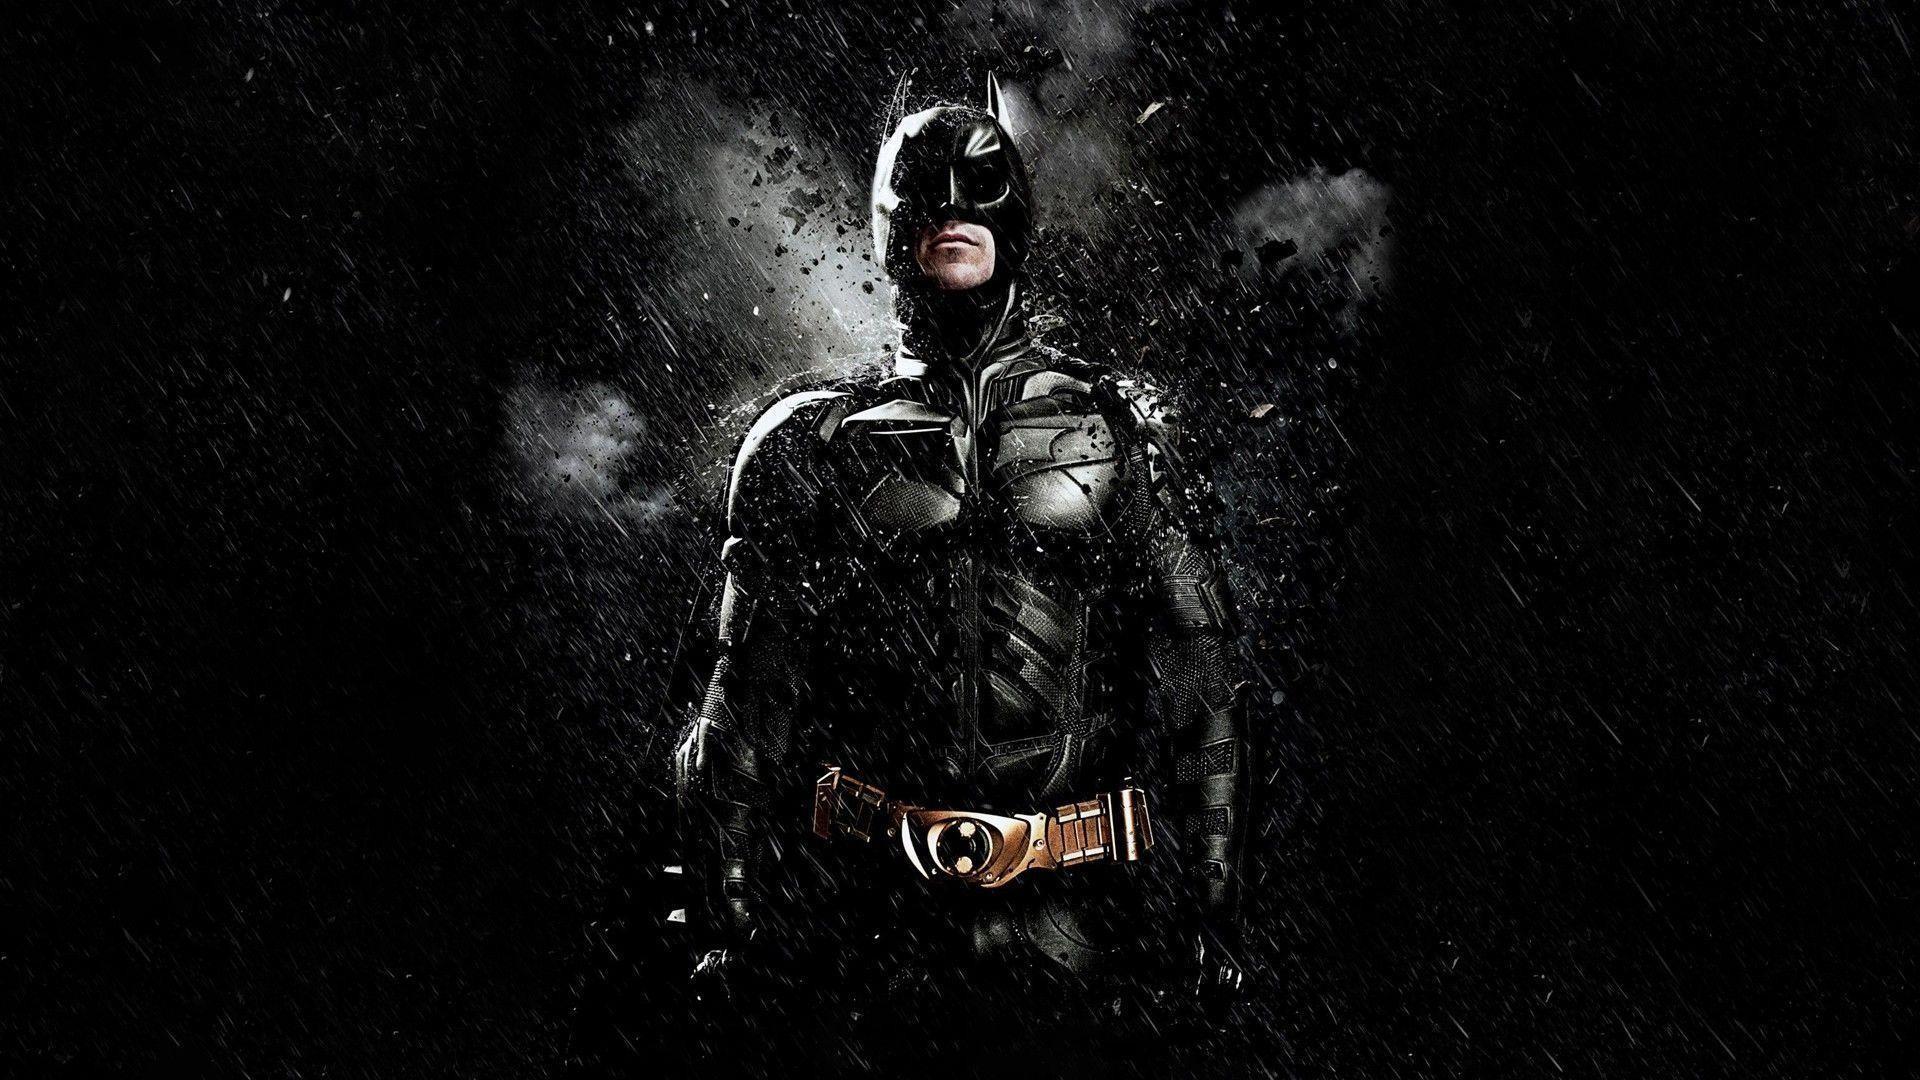 Batman Wallpaper Images & Pictures – Becuo